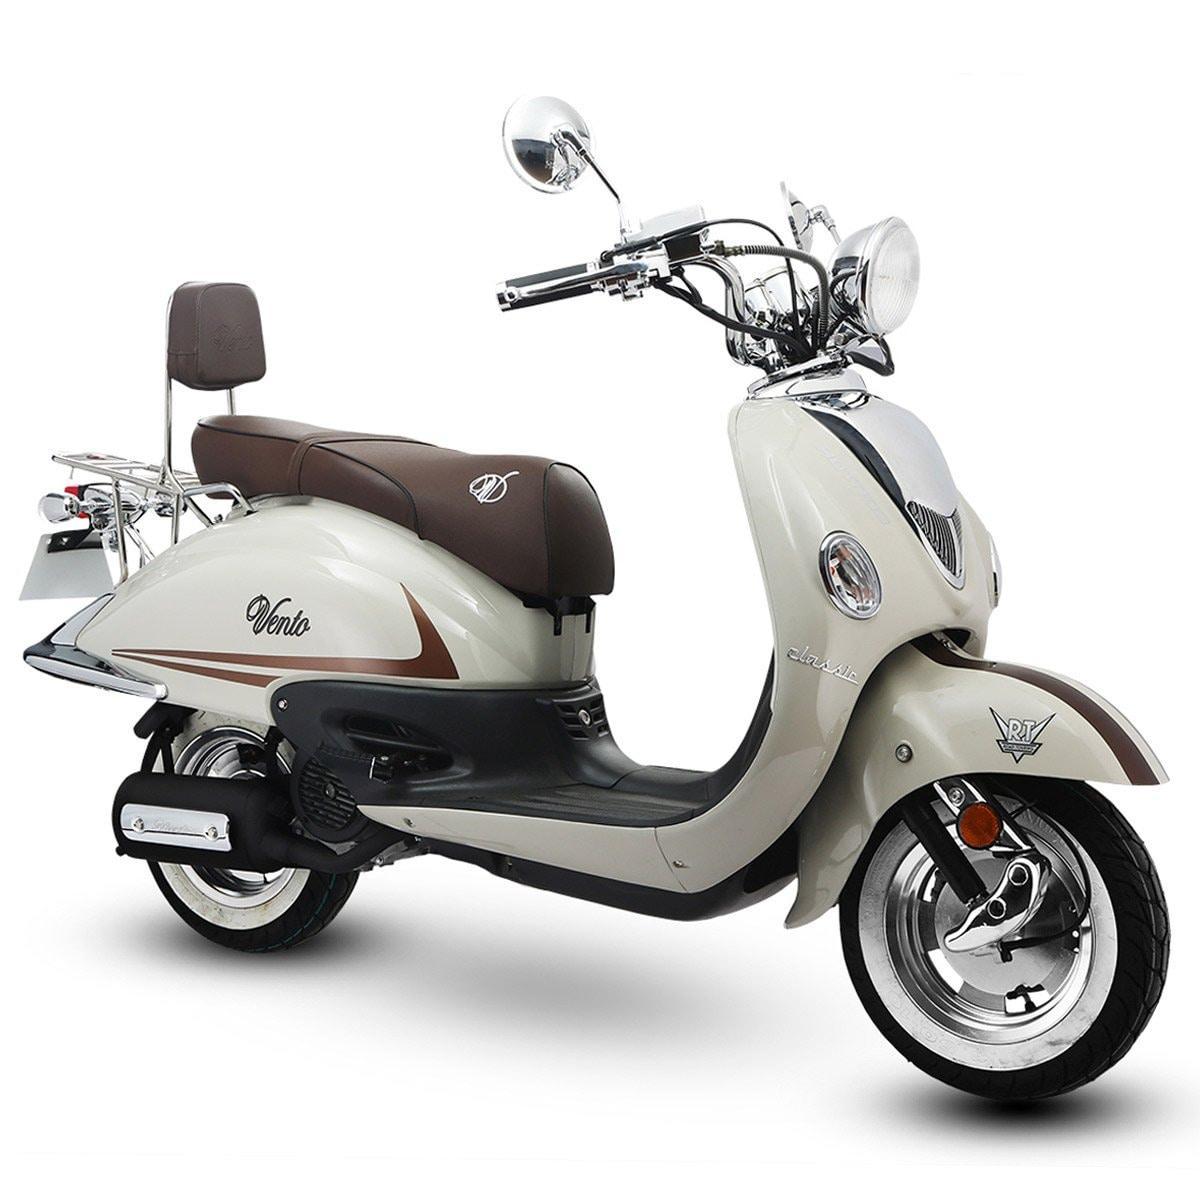 Scooter Hotrod Rt Beige 150 Cc Vento